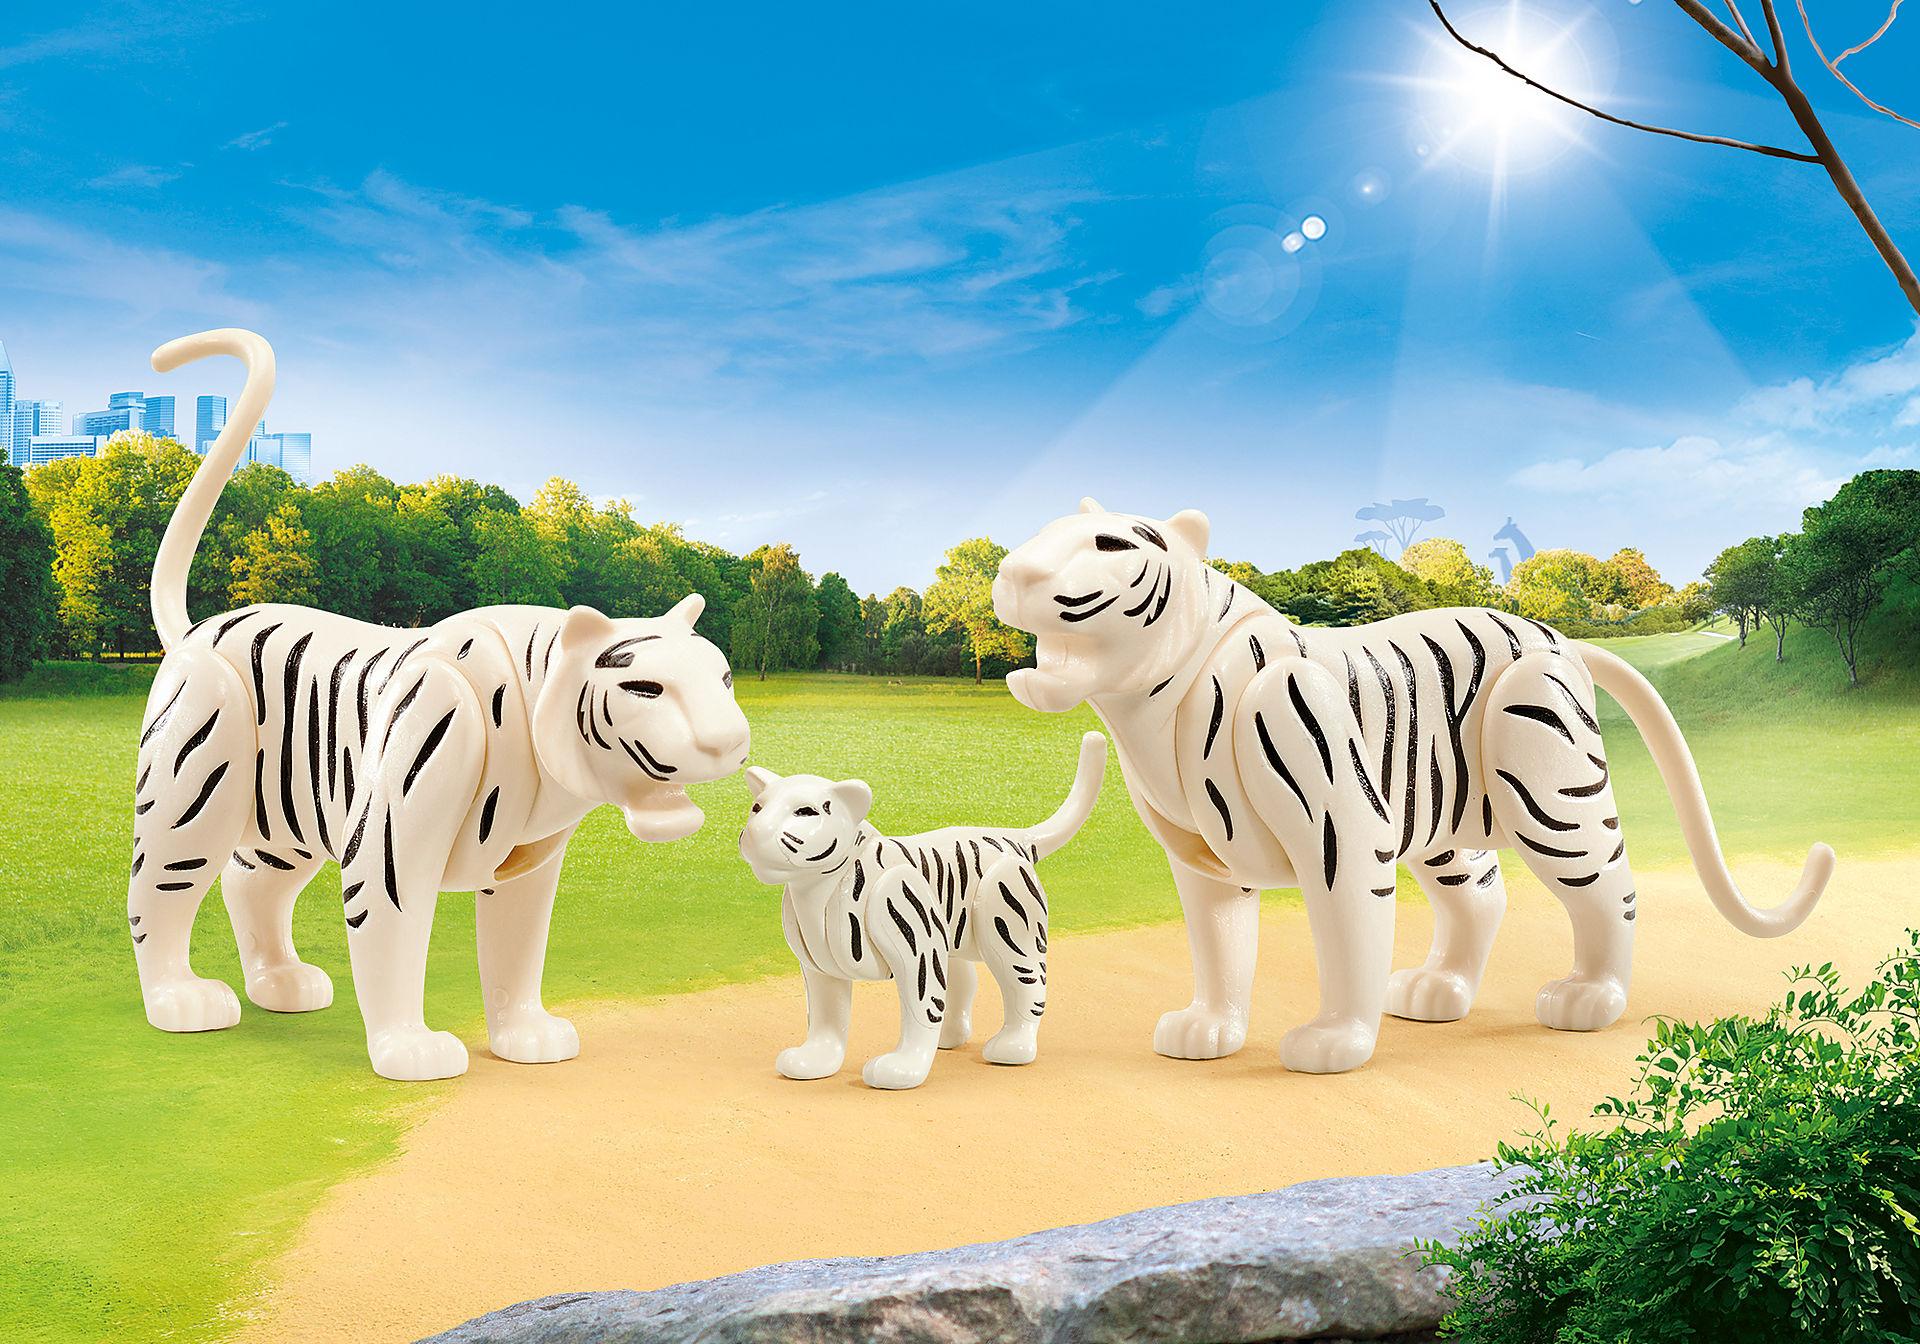 9872 Tigres Brancos zoom image1